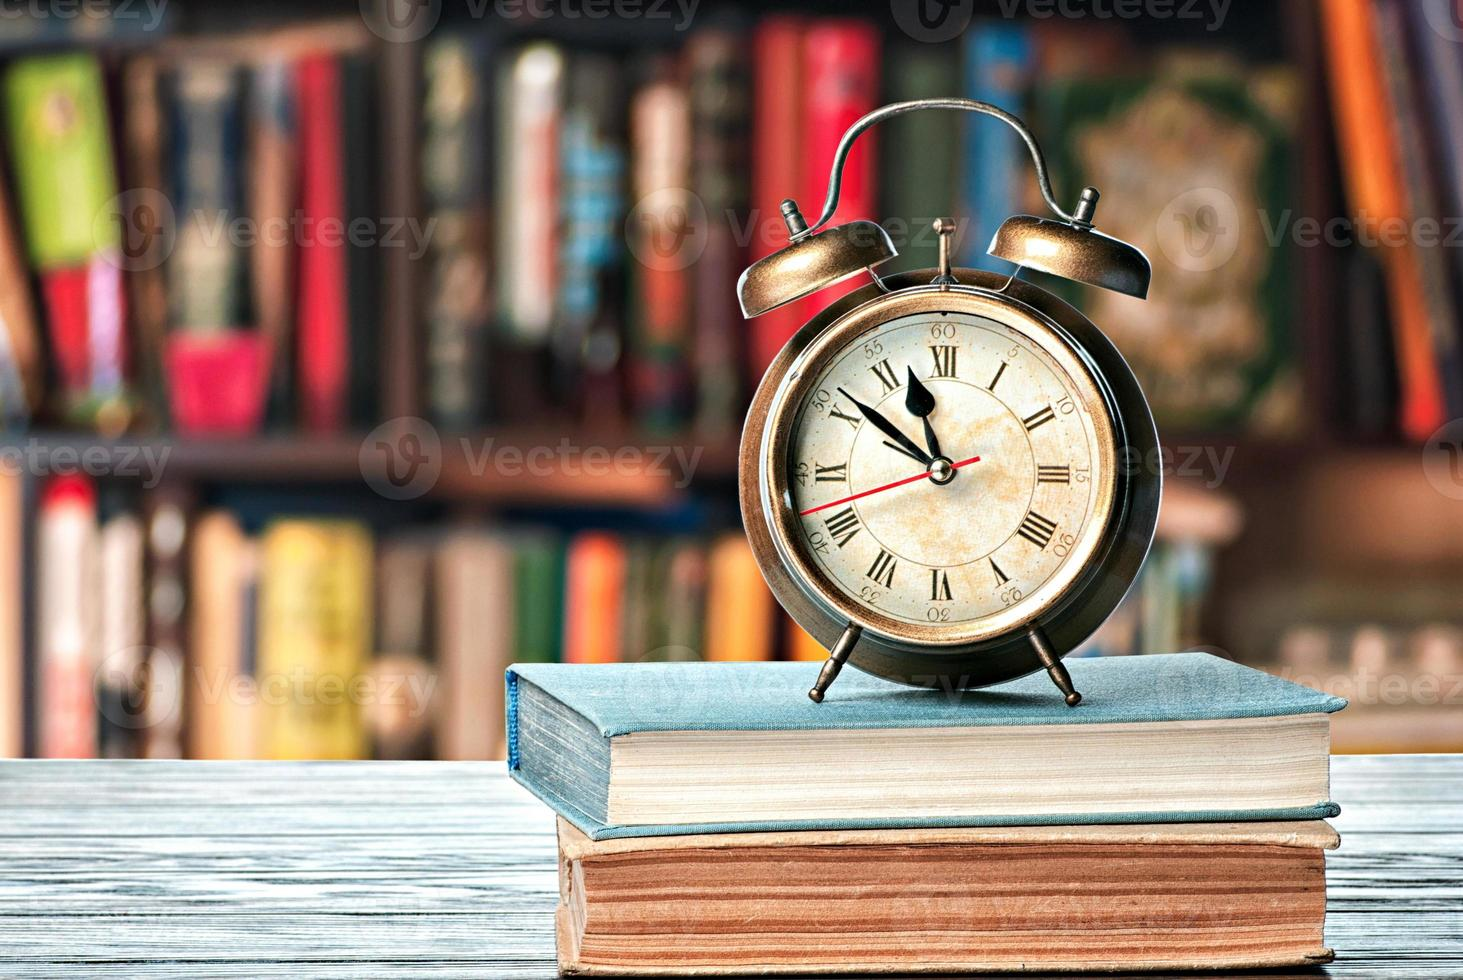 Books and alarm clock photo